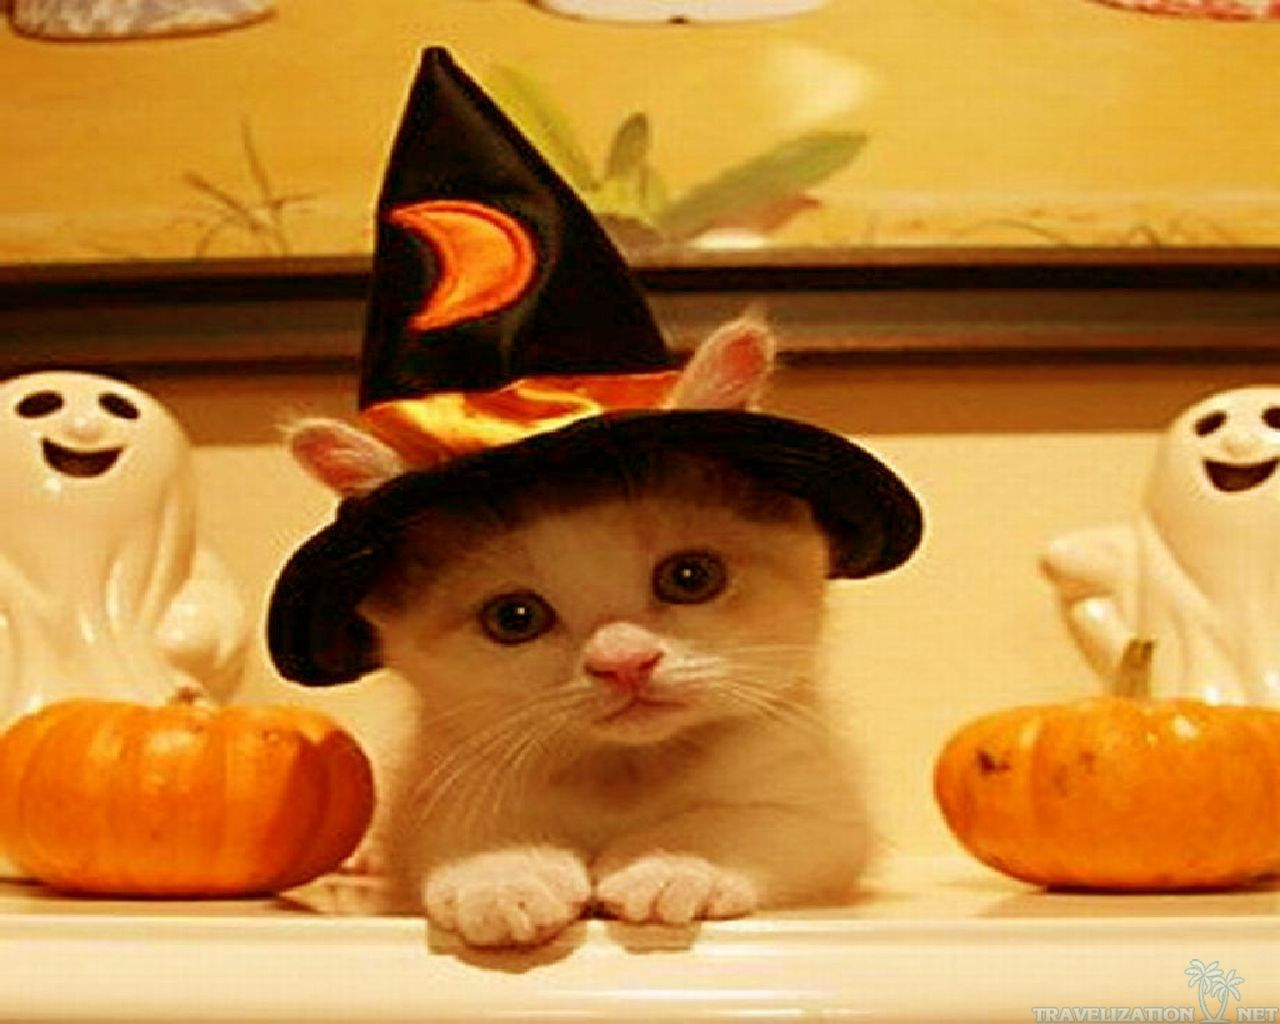 Cute Halloween Wallpaper Backgrounds - WallpaperSafari